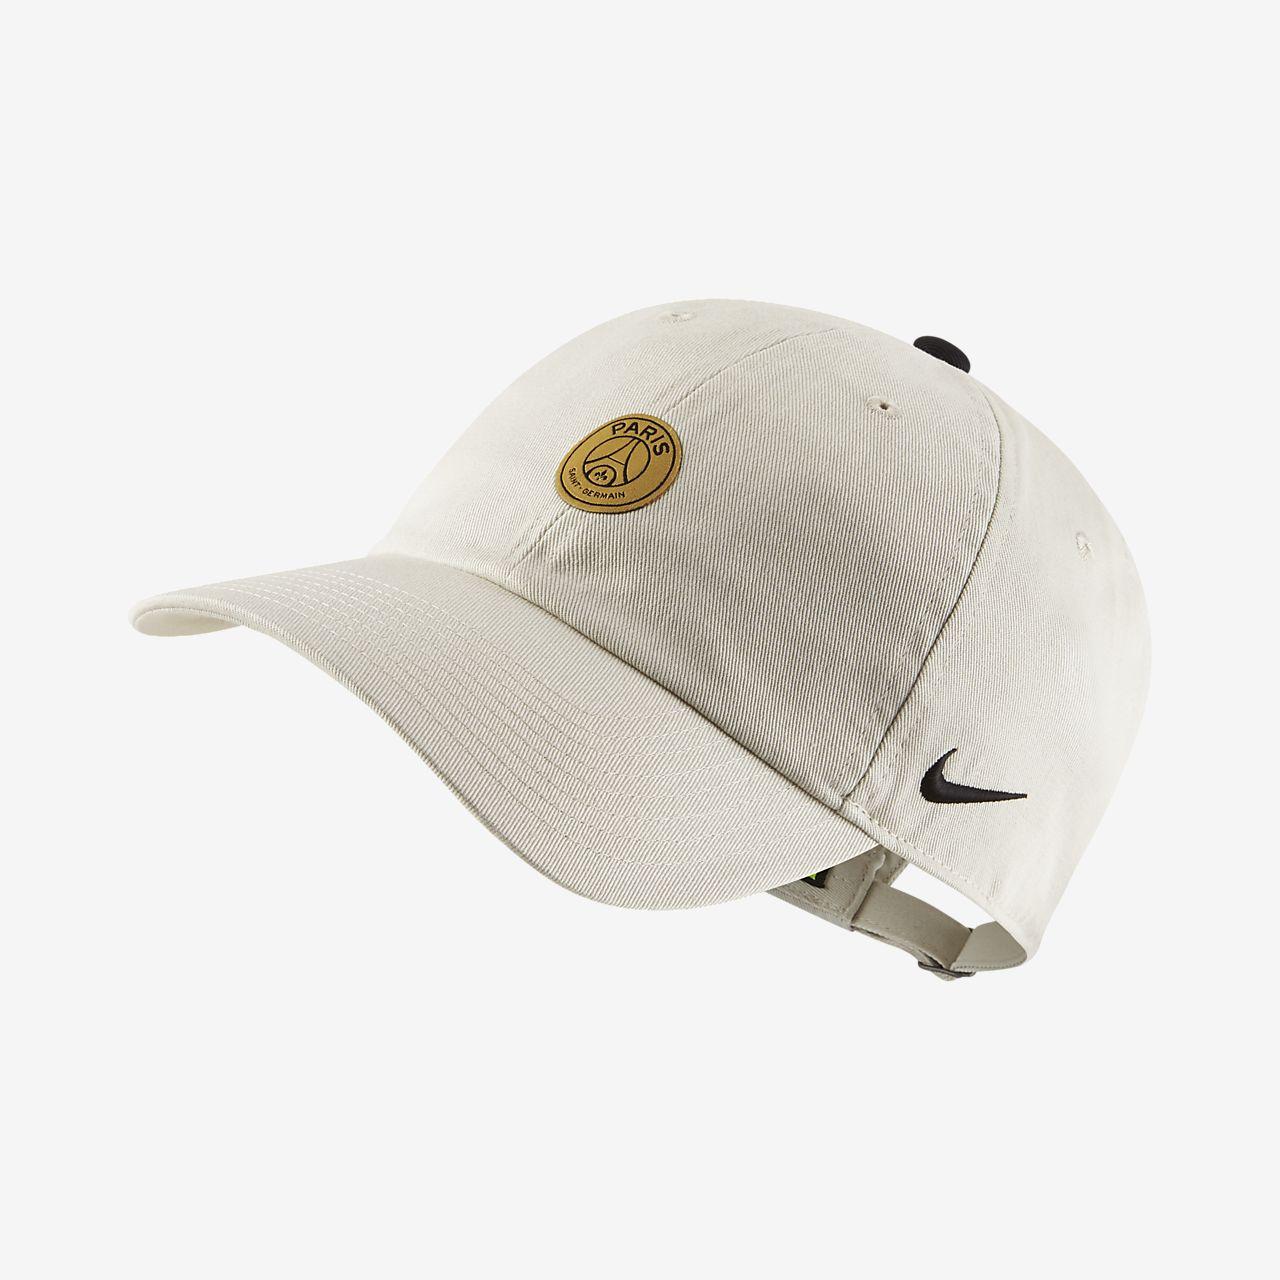 d17cd6371eb81 Paris Saint-Germain Heritage 86 Adjustable Hat. Nike.com DK